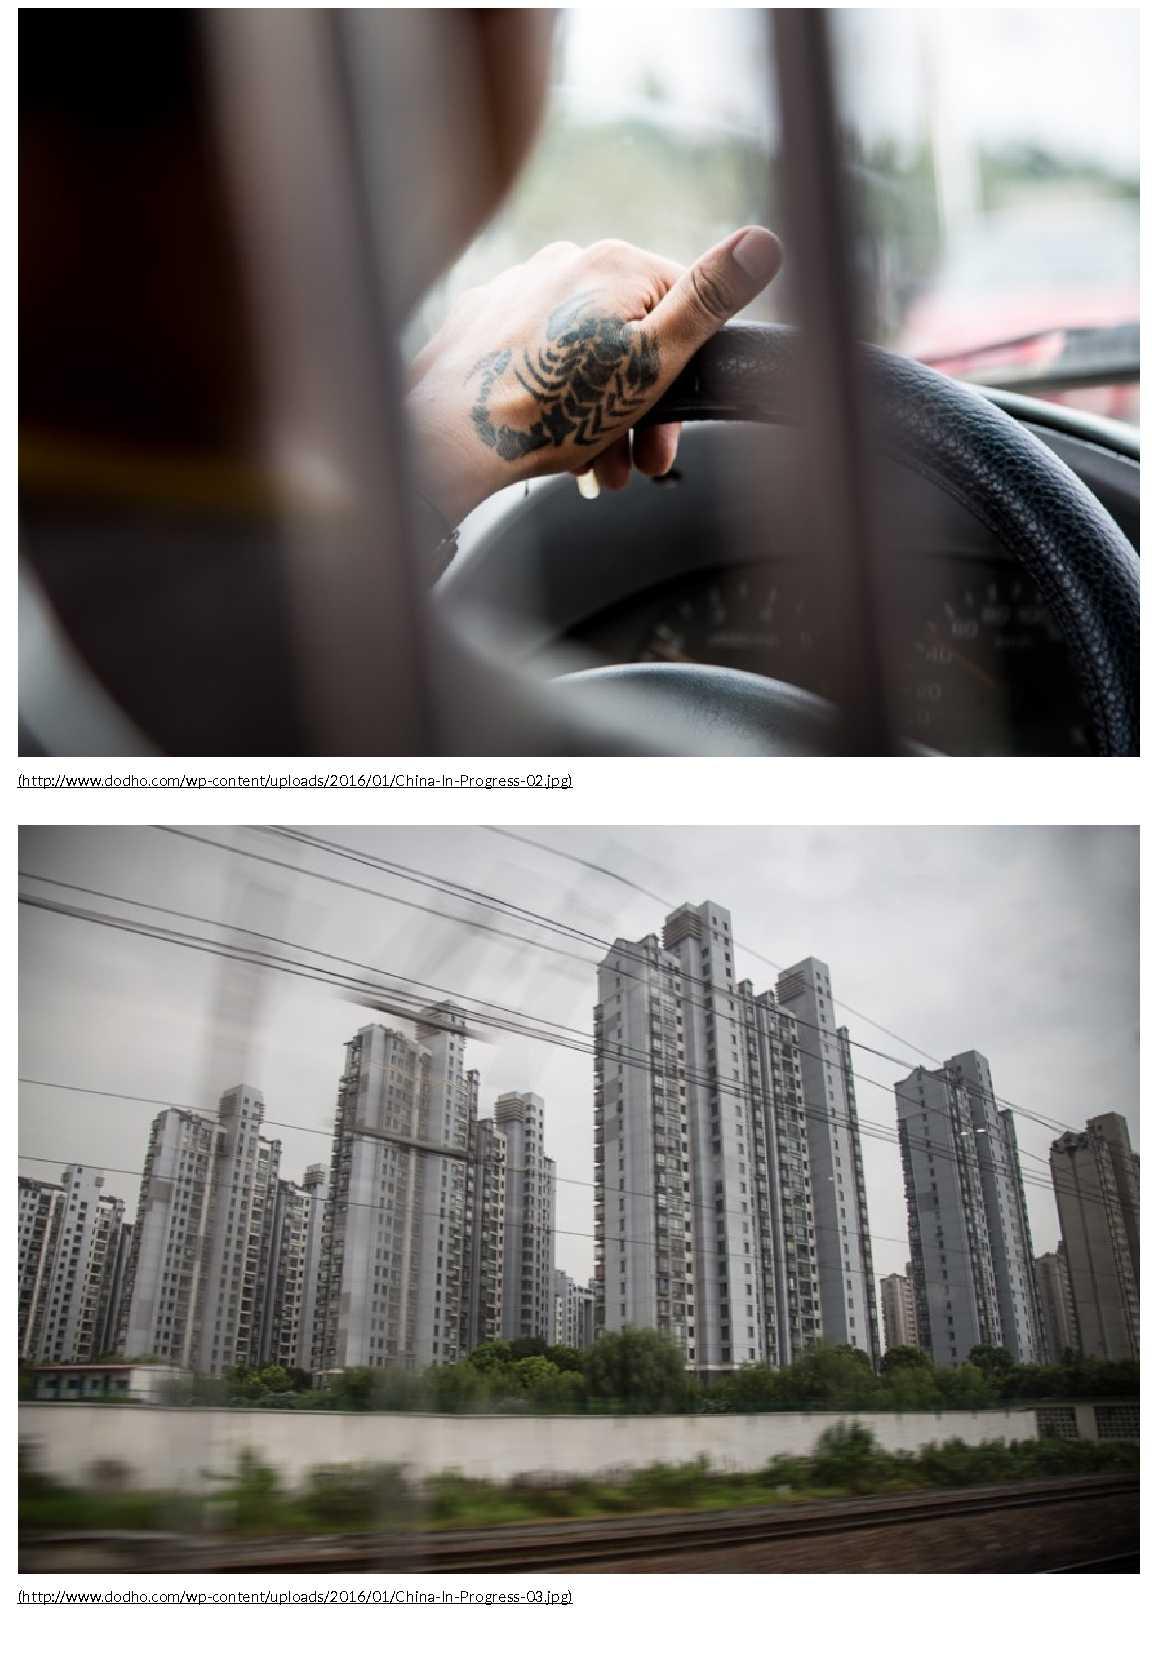 DODHO Photography Magazine https://www.dodho.com/china-in-progress-by-rosa-rodriguez/